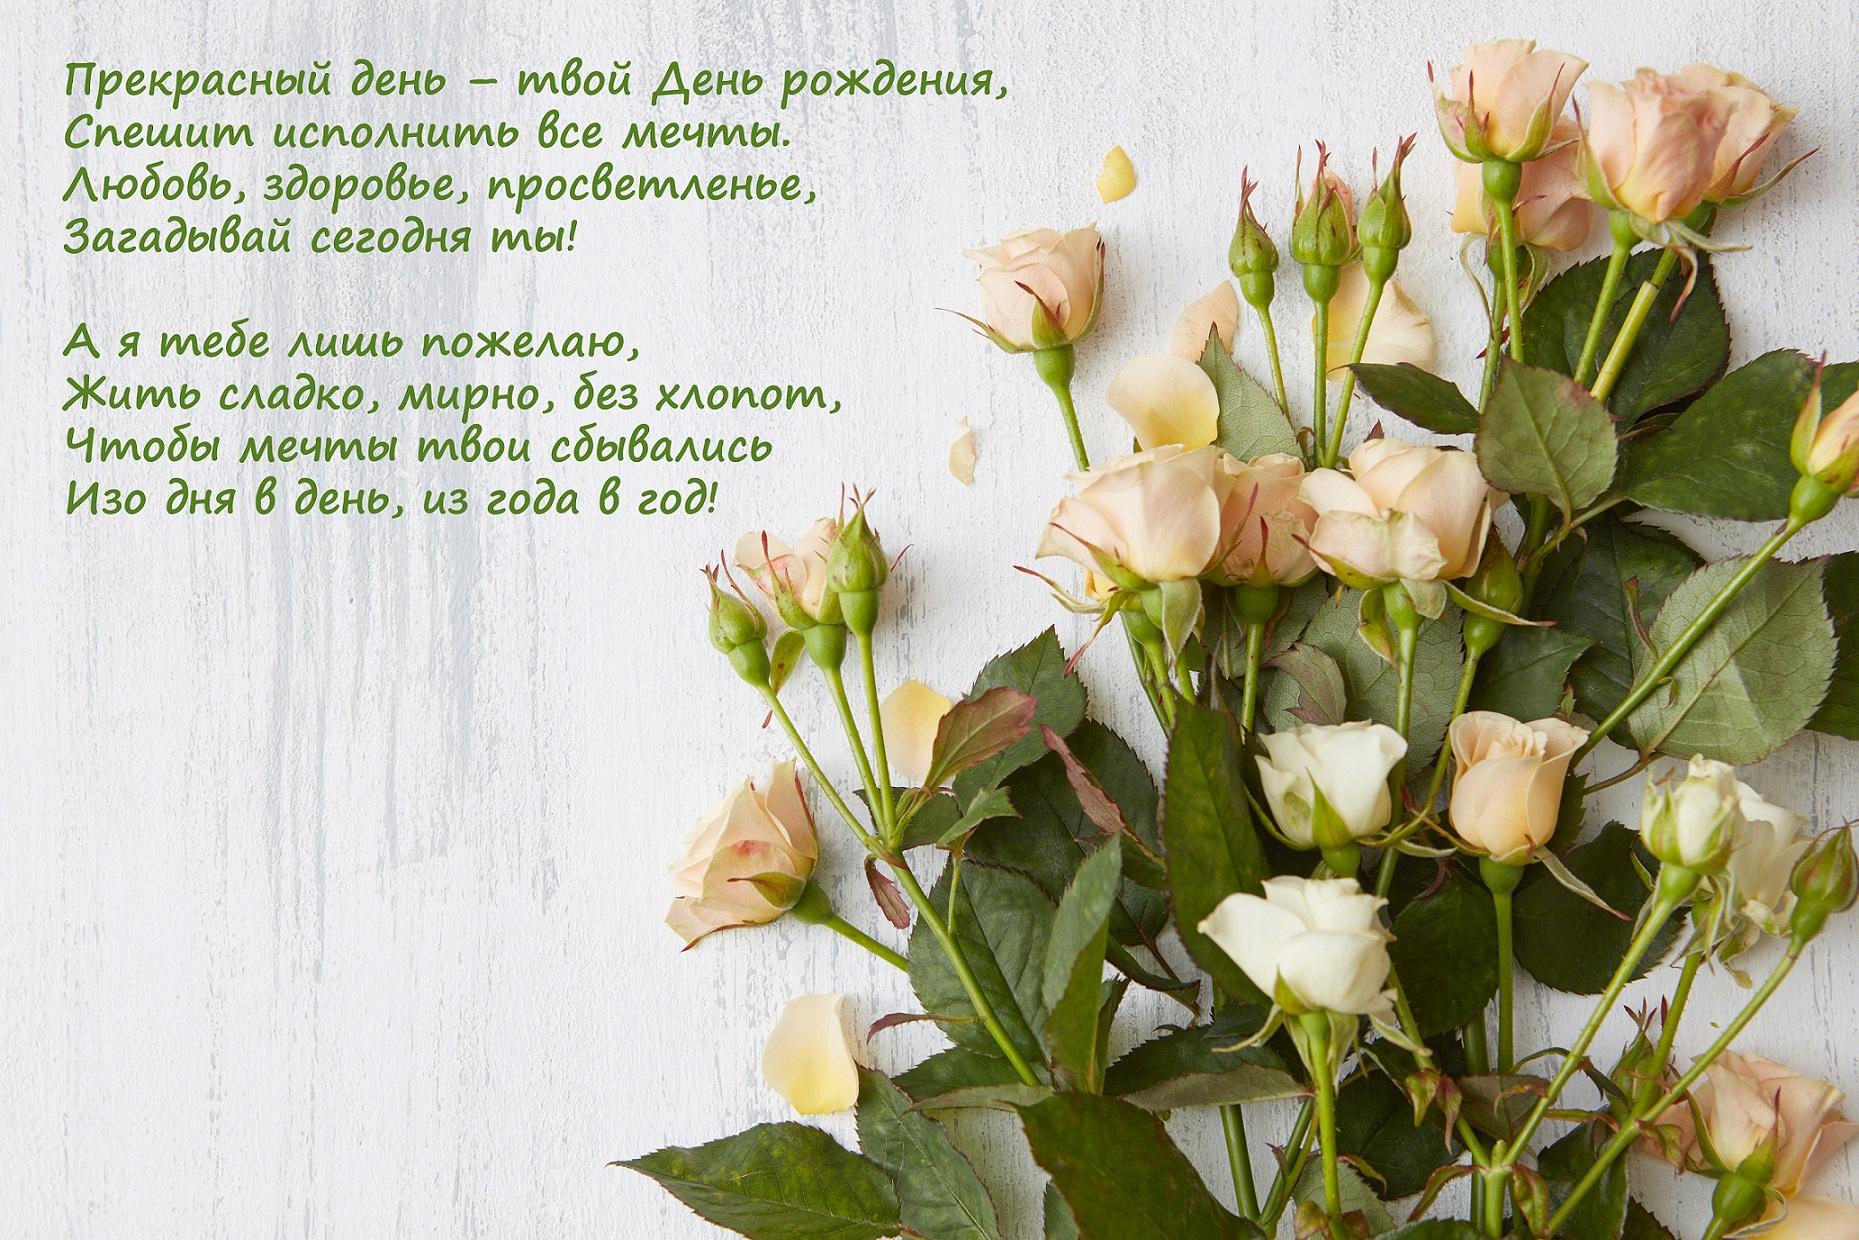 Цветы открытки со стихами, ммс билайн